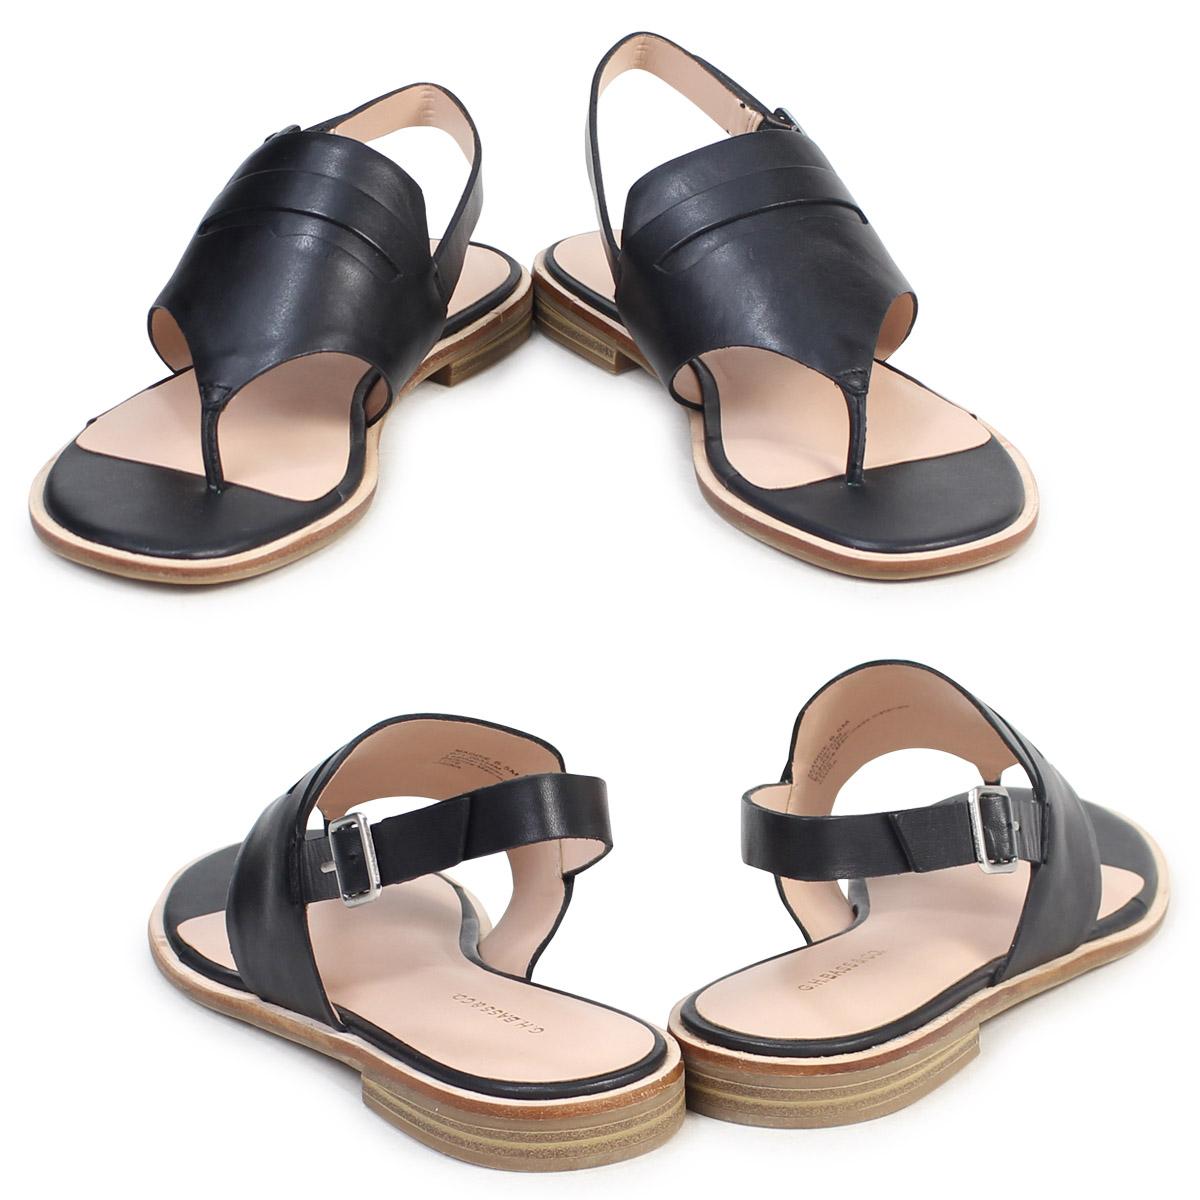 9fd45d70dde G.H. BASS sandals lady's G H bus tong ankle strap MADDIE THONG SANDAL  71-20,334 shoes black black